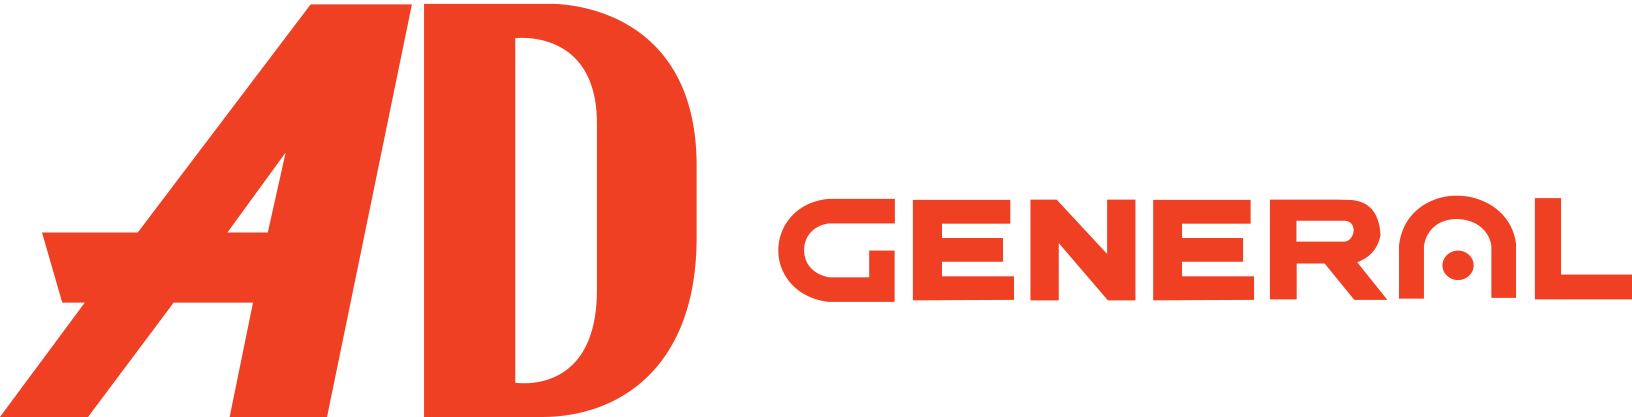 AD General